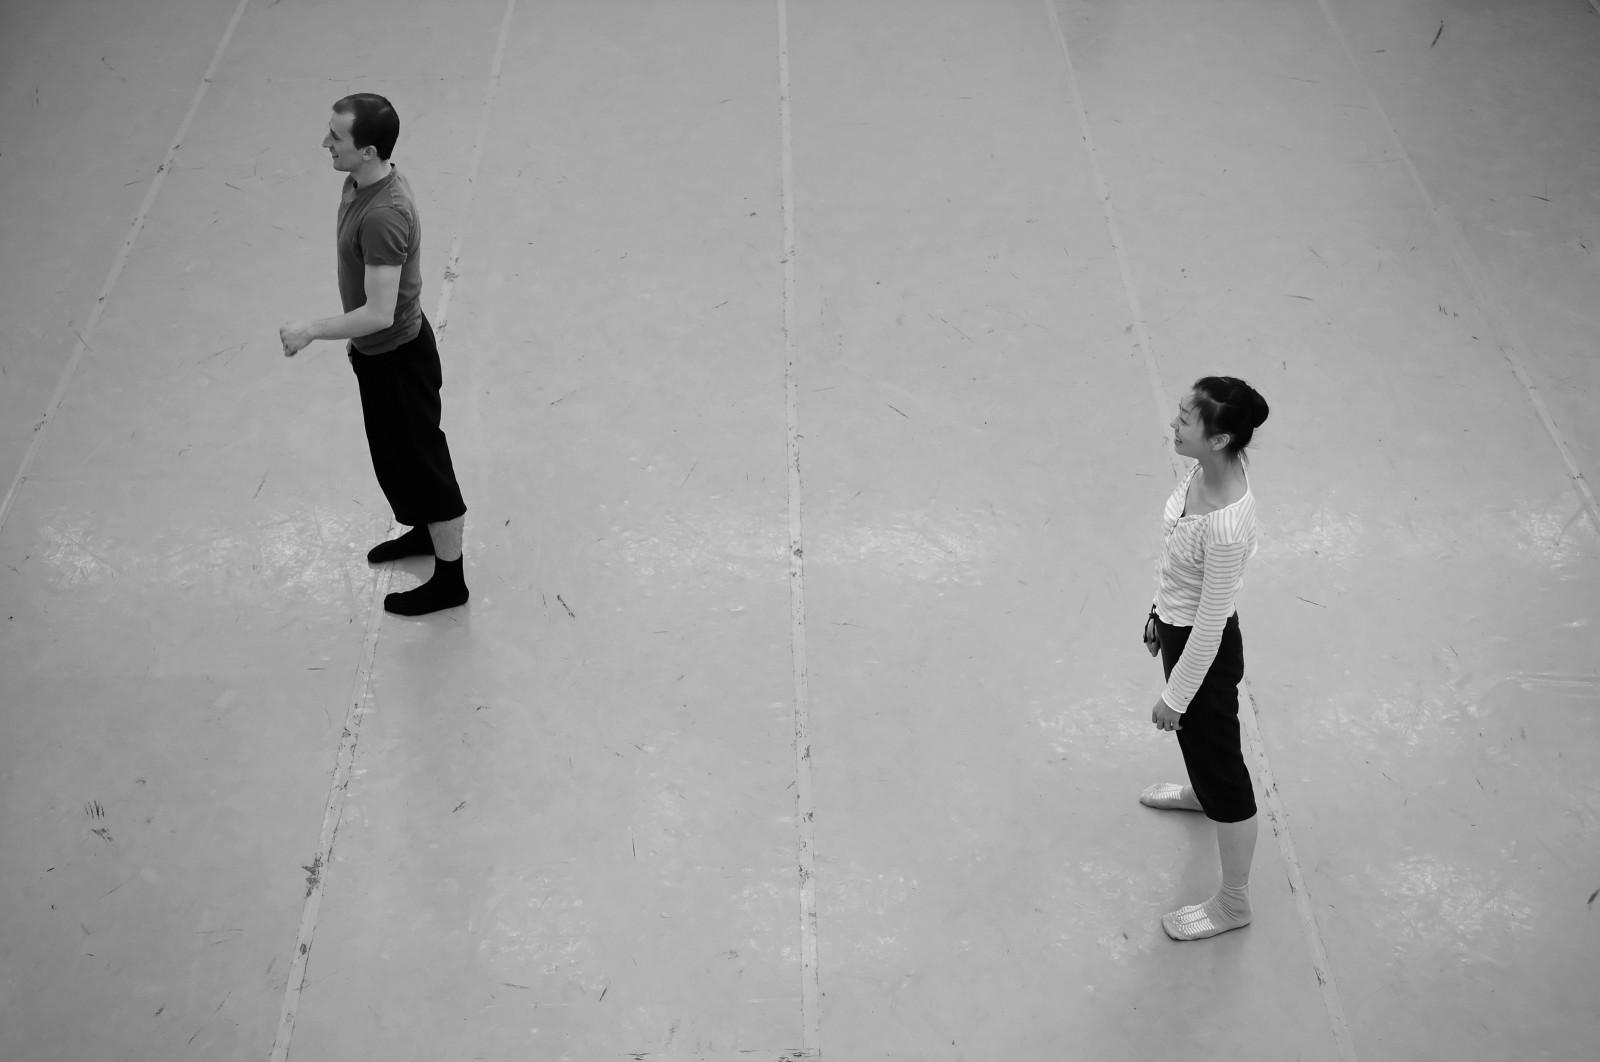 rehearsal photo https://make-move-think.org/